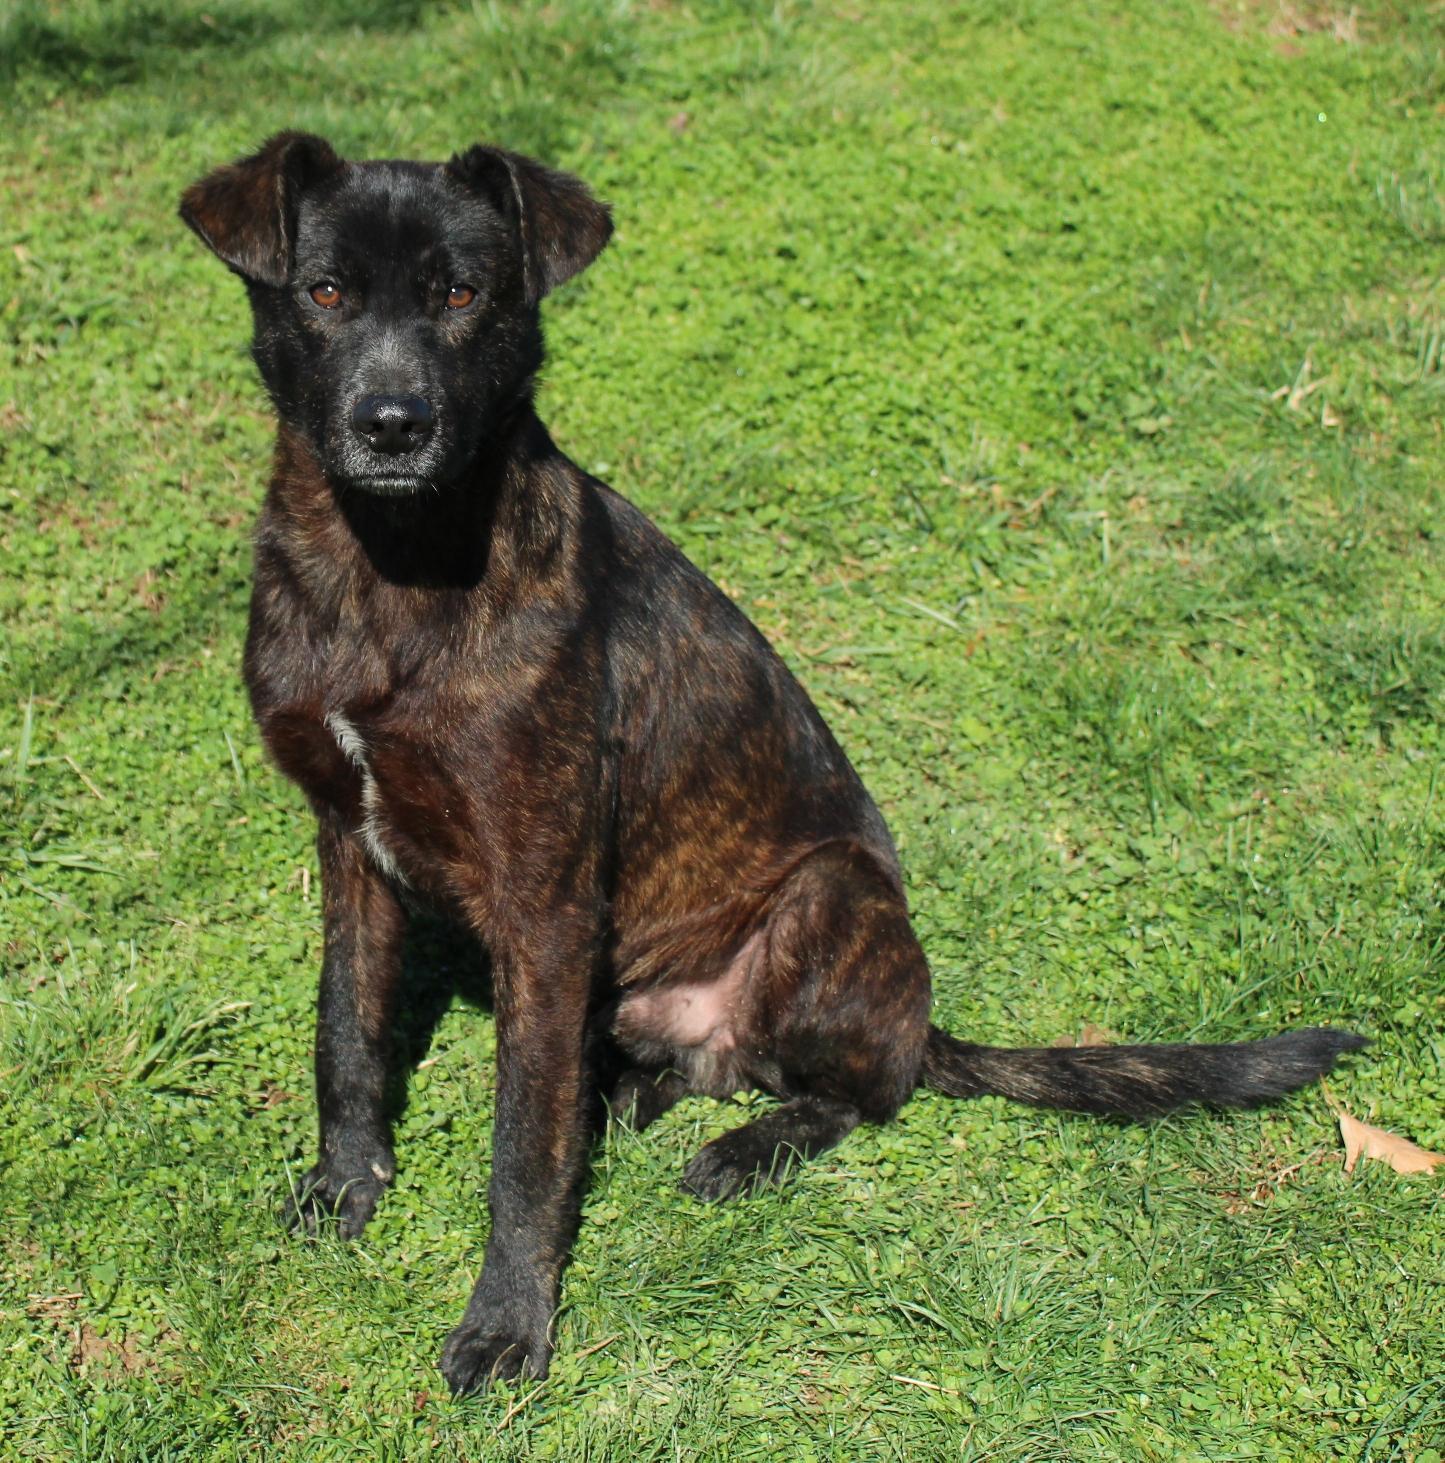 Bruce 2* (1 yr 40 lb) adoption pending 3/9 trans